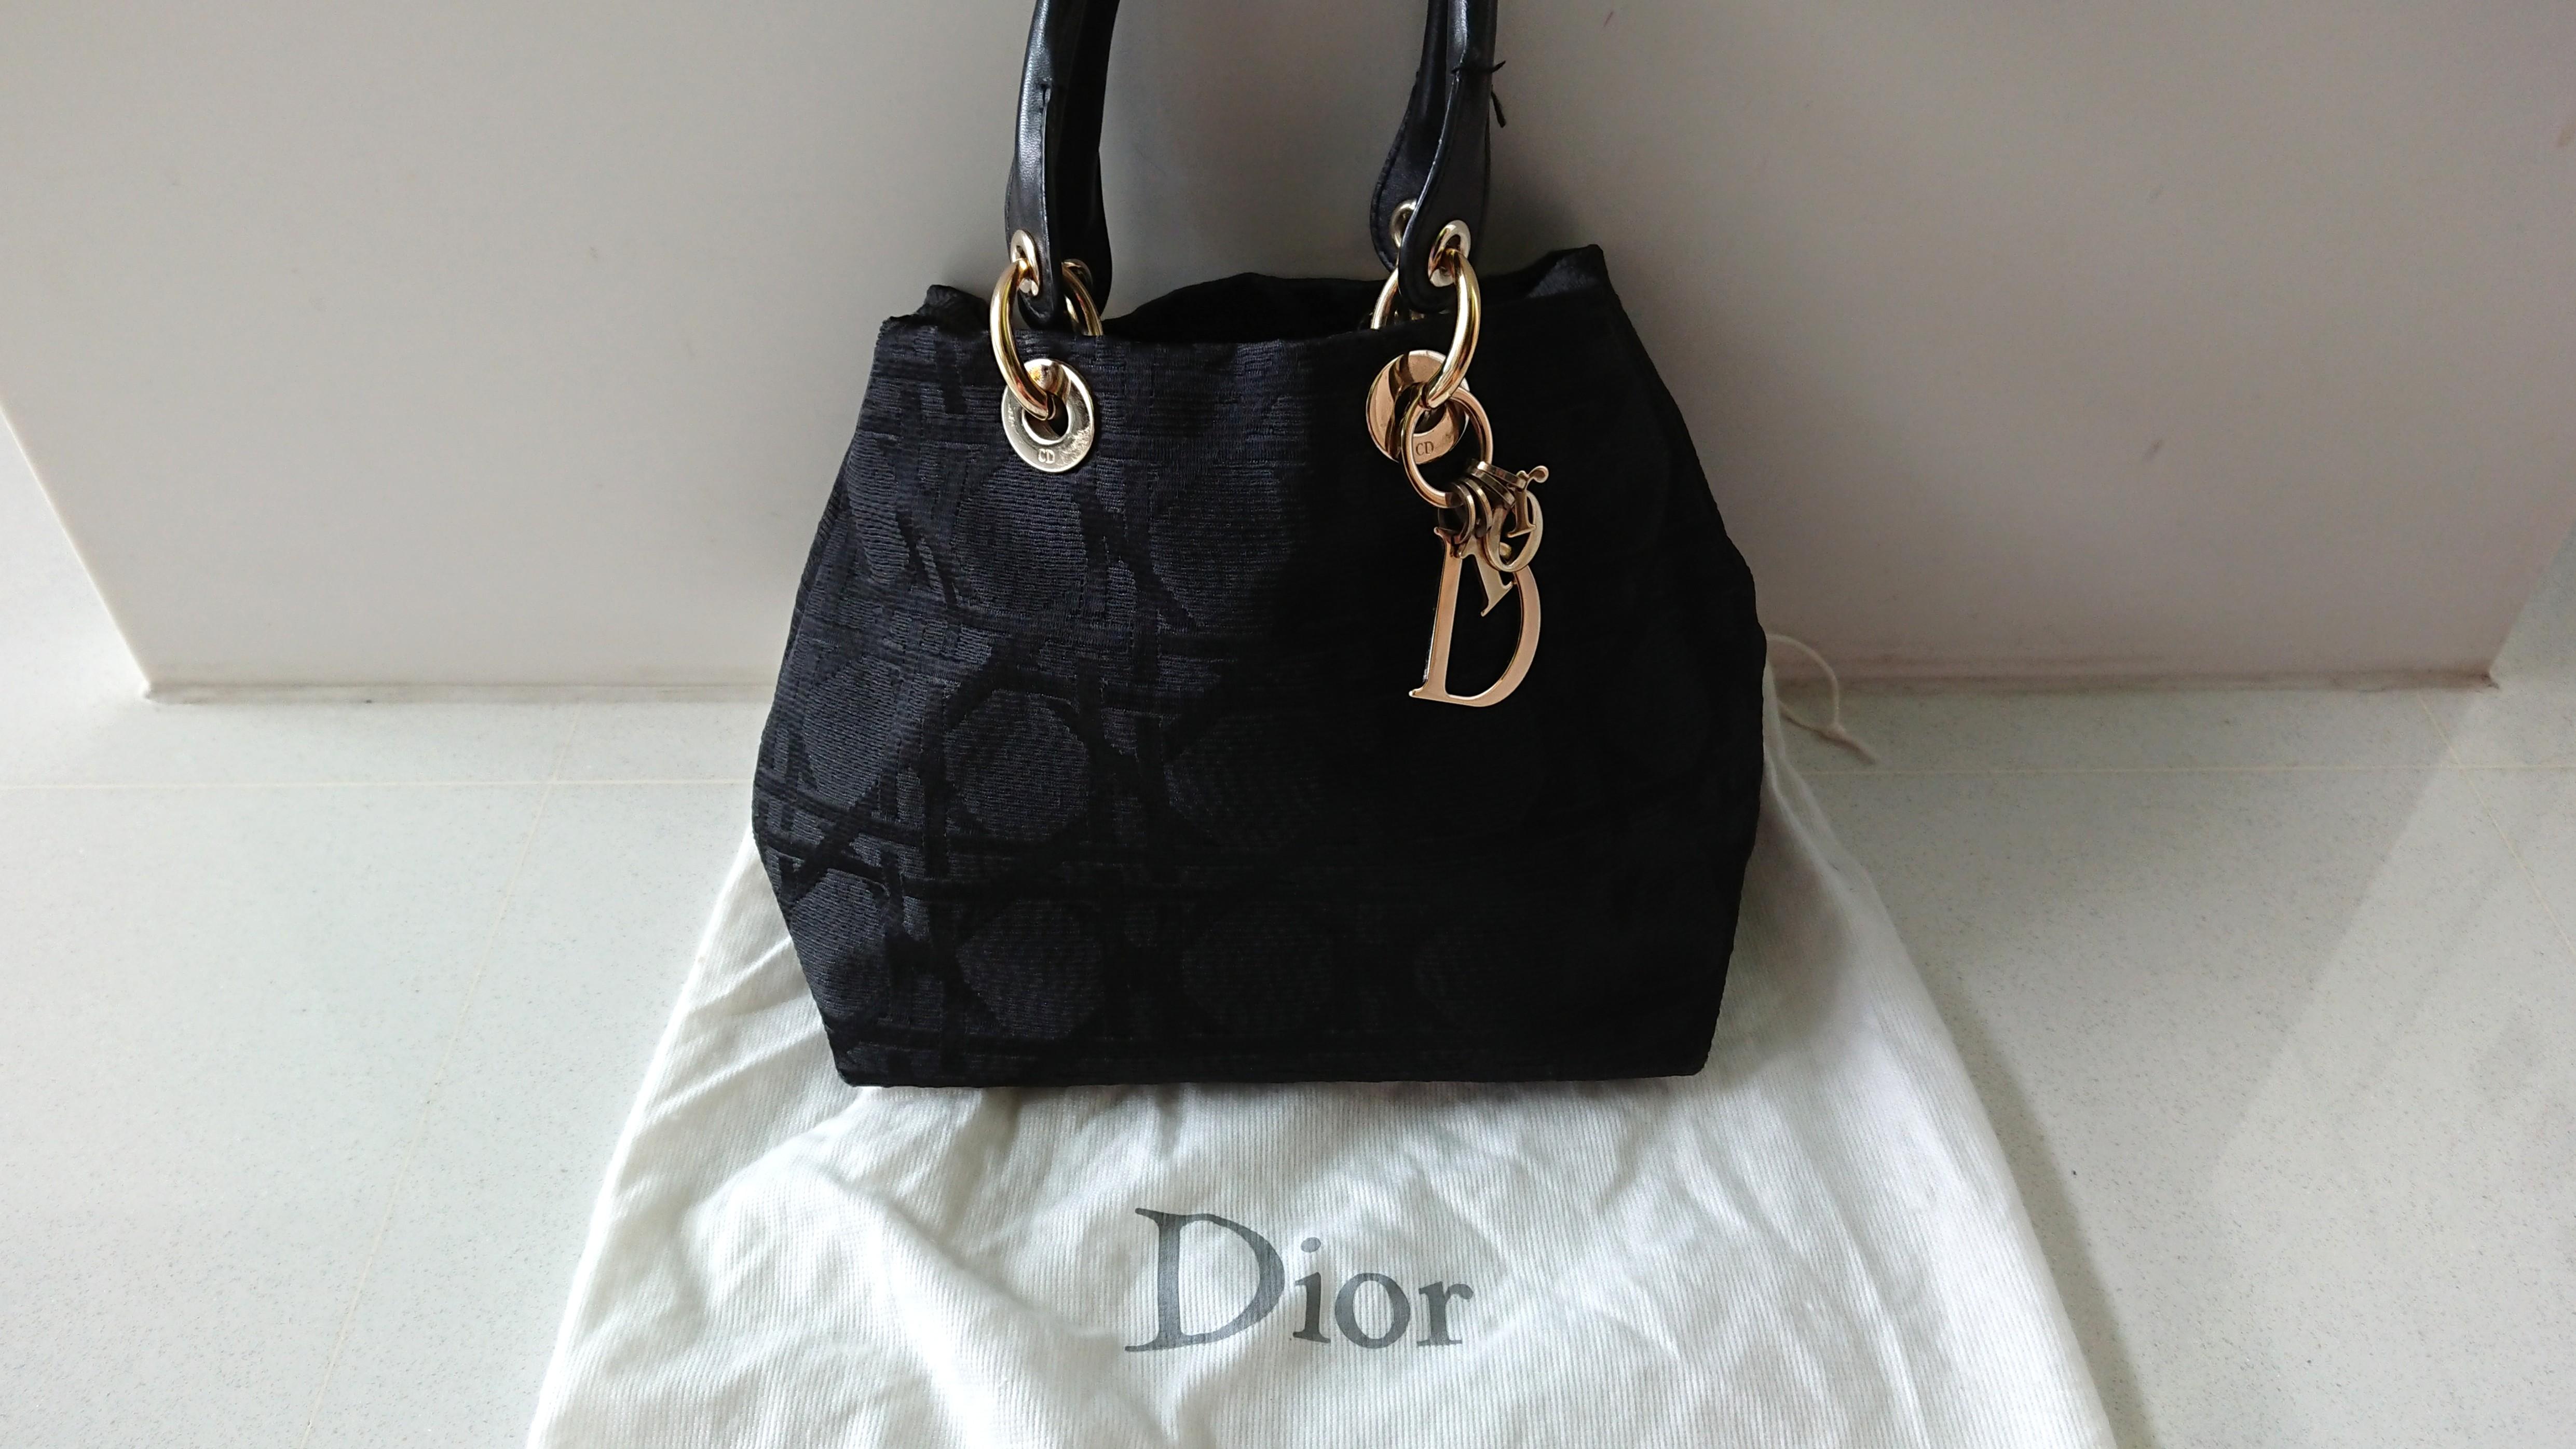 e0df4c9651d5 Christian Dior Lady Dior handbag in Black canvas Cannage in Gold ...